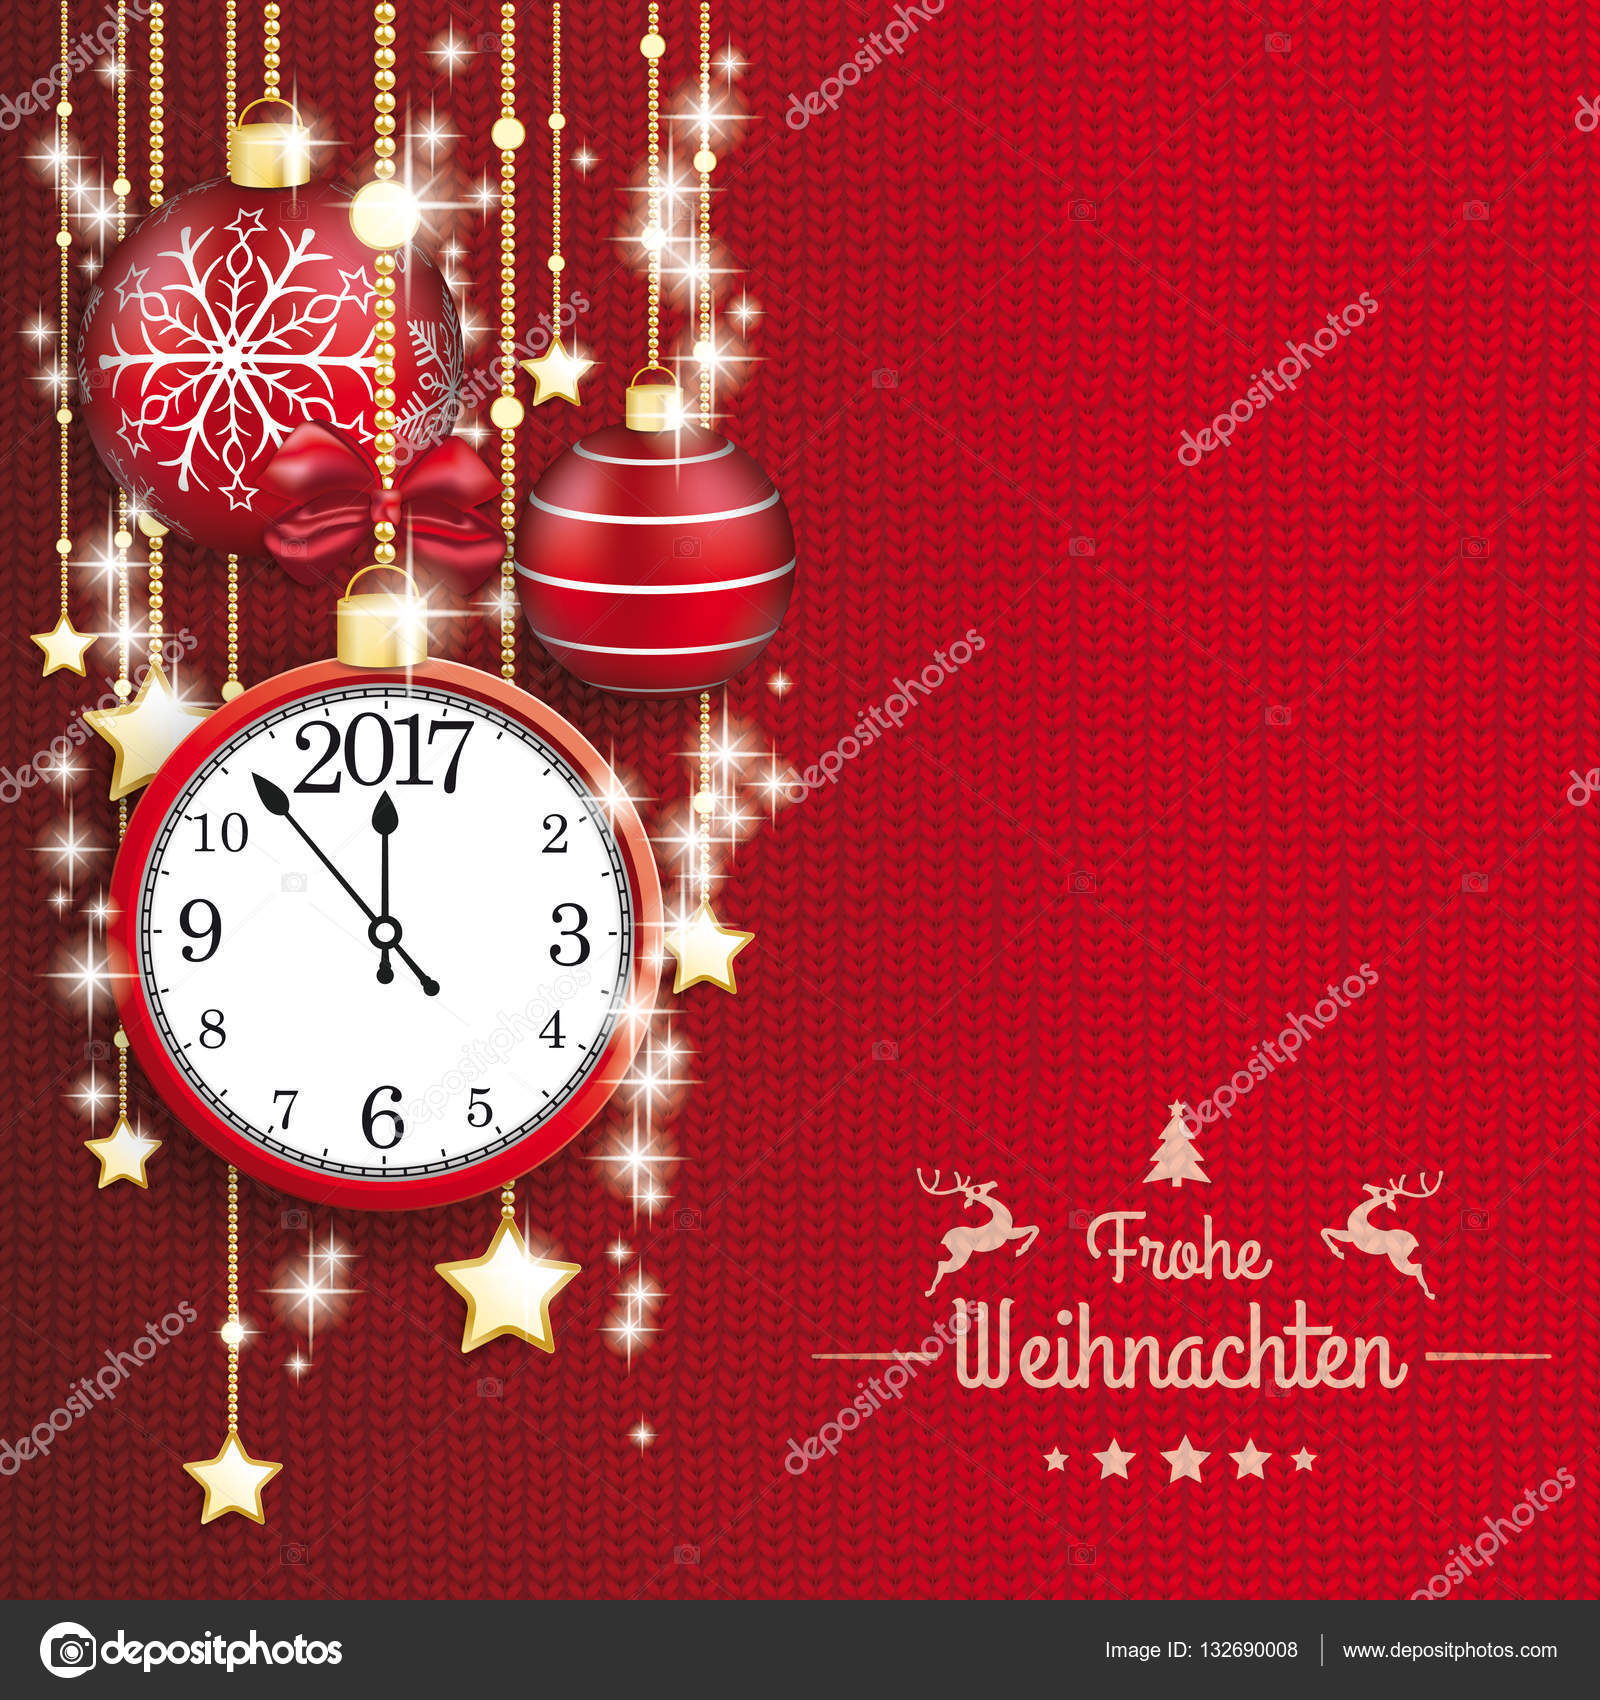 frohe weihnachten card stock vektor limbi007 132690008. Black Bedroom Furniture Sets. Home Design Ideas